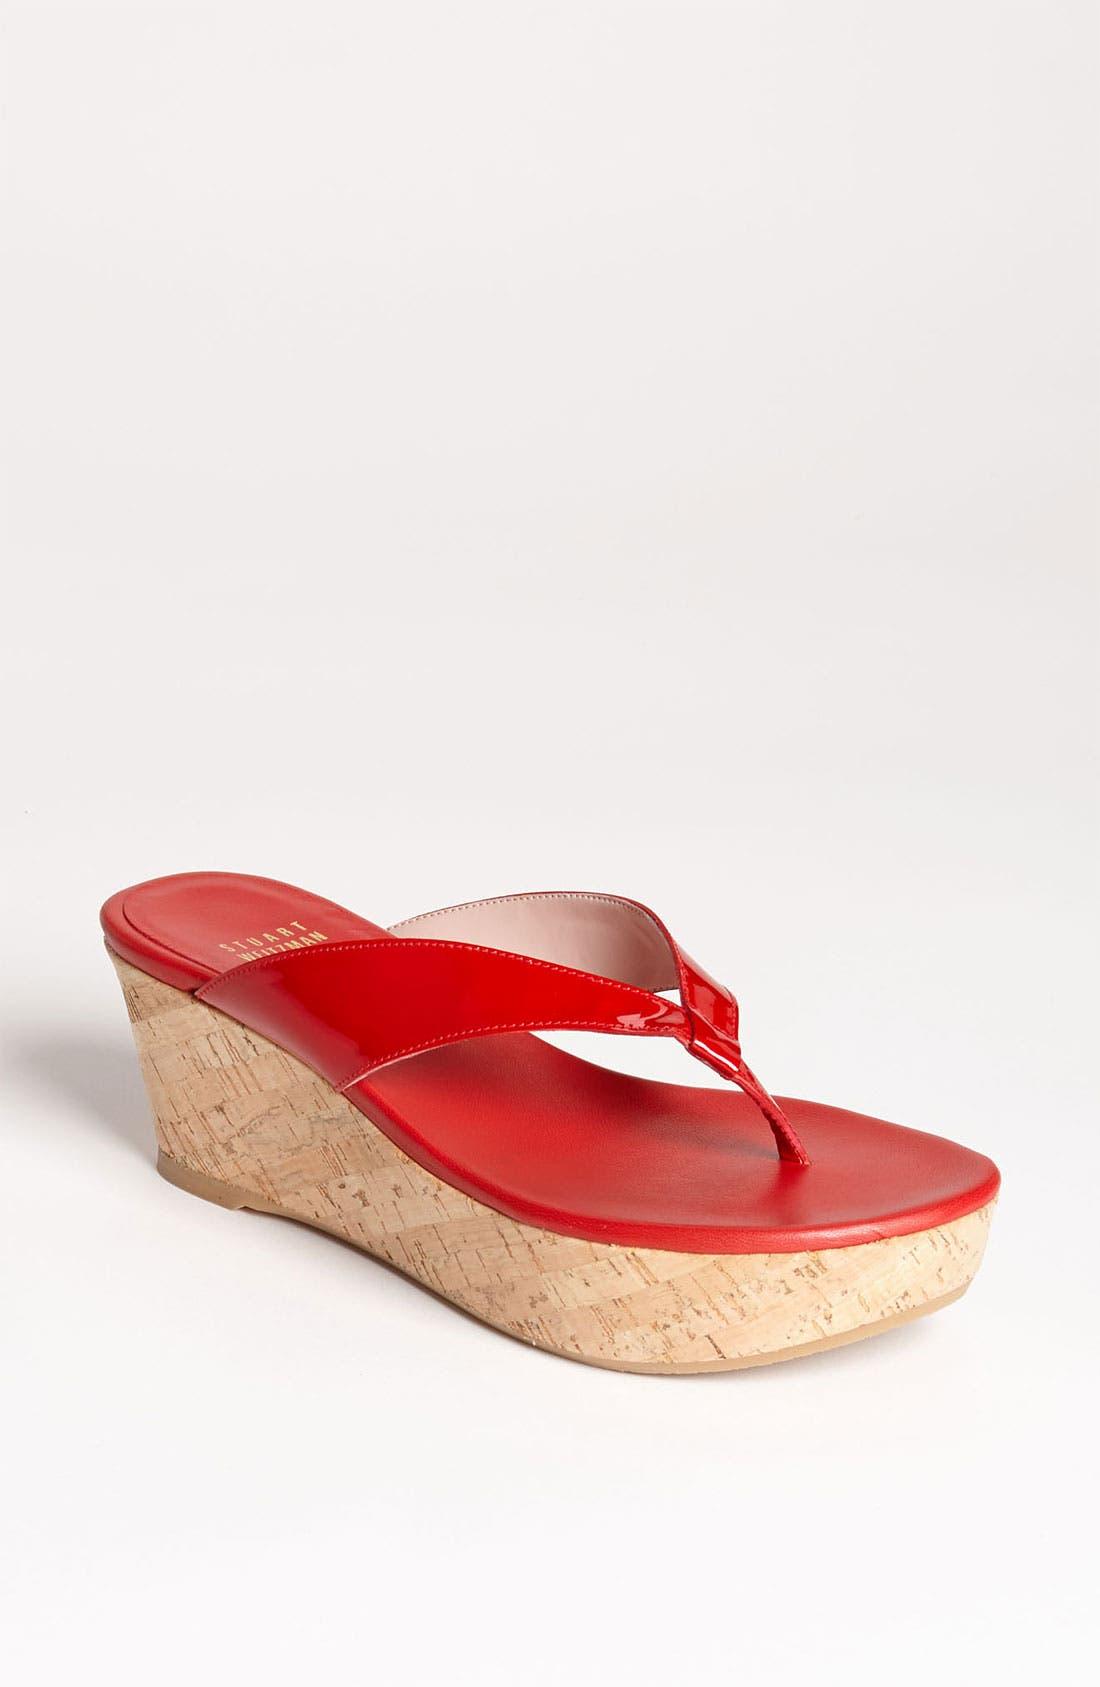 Alternate Image 1 Selected - Stuart Weitzman 'Clasp' Sandal